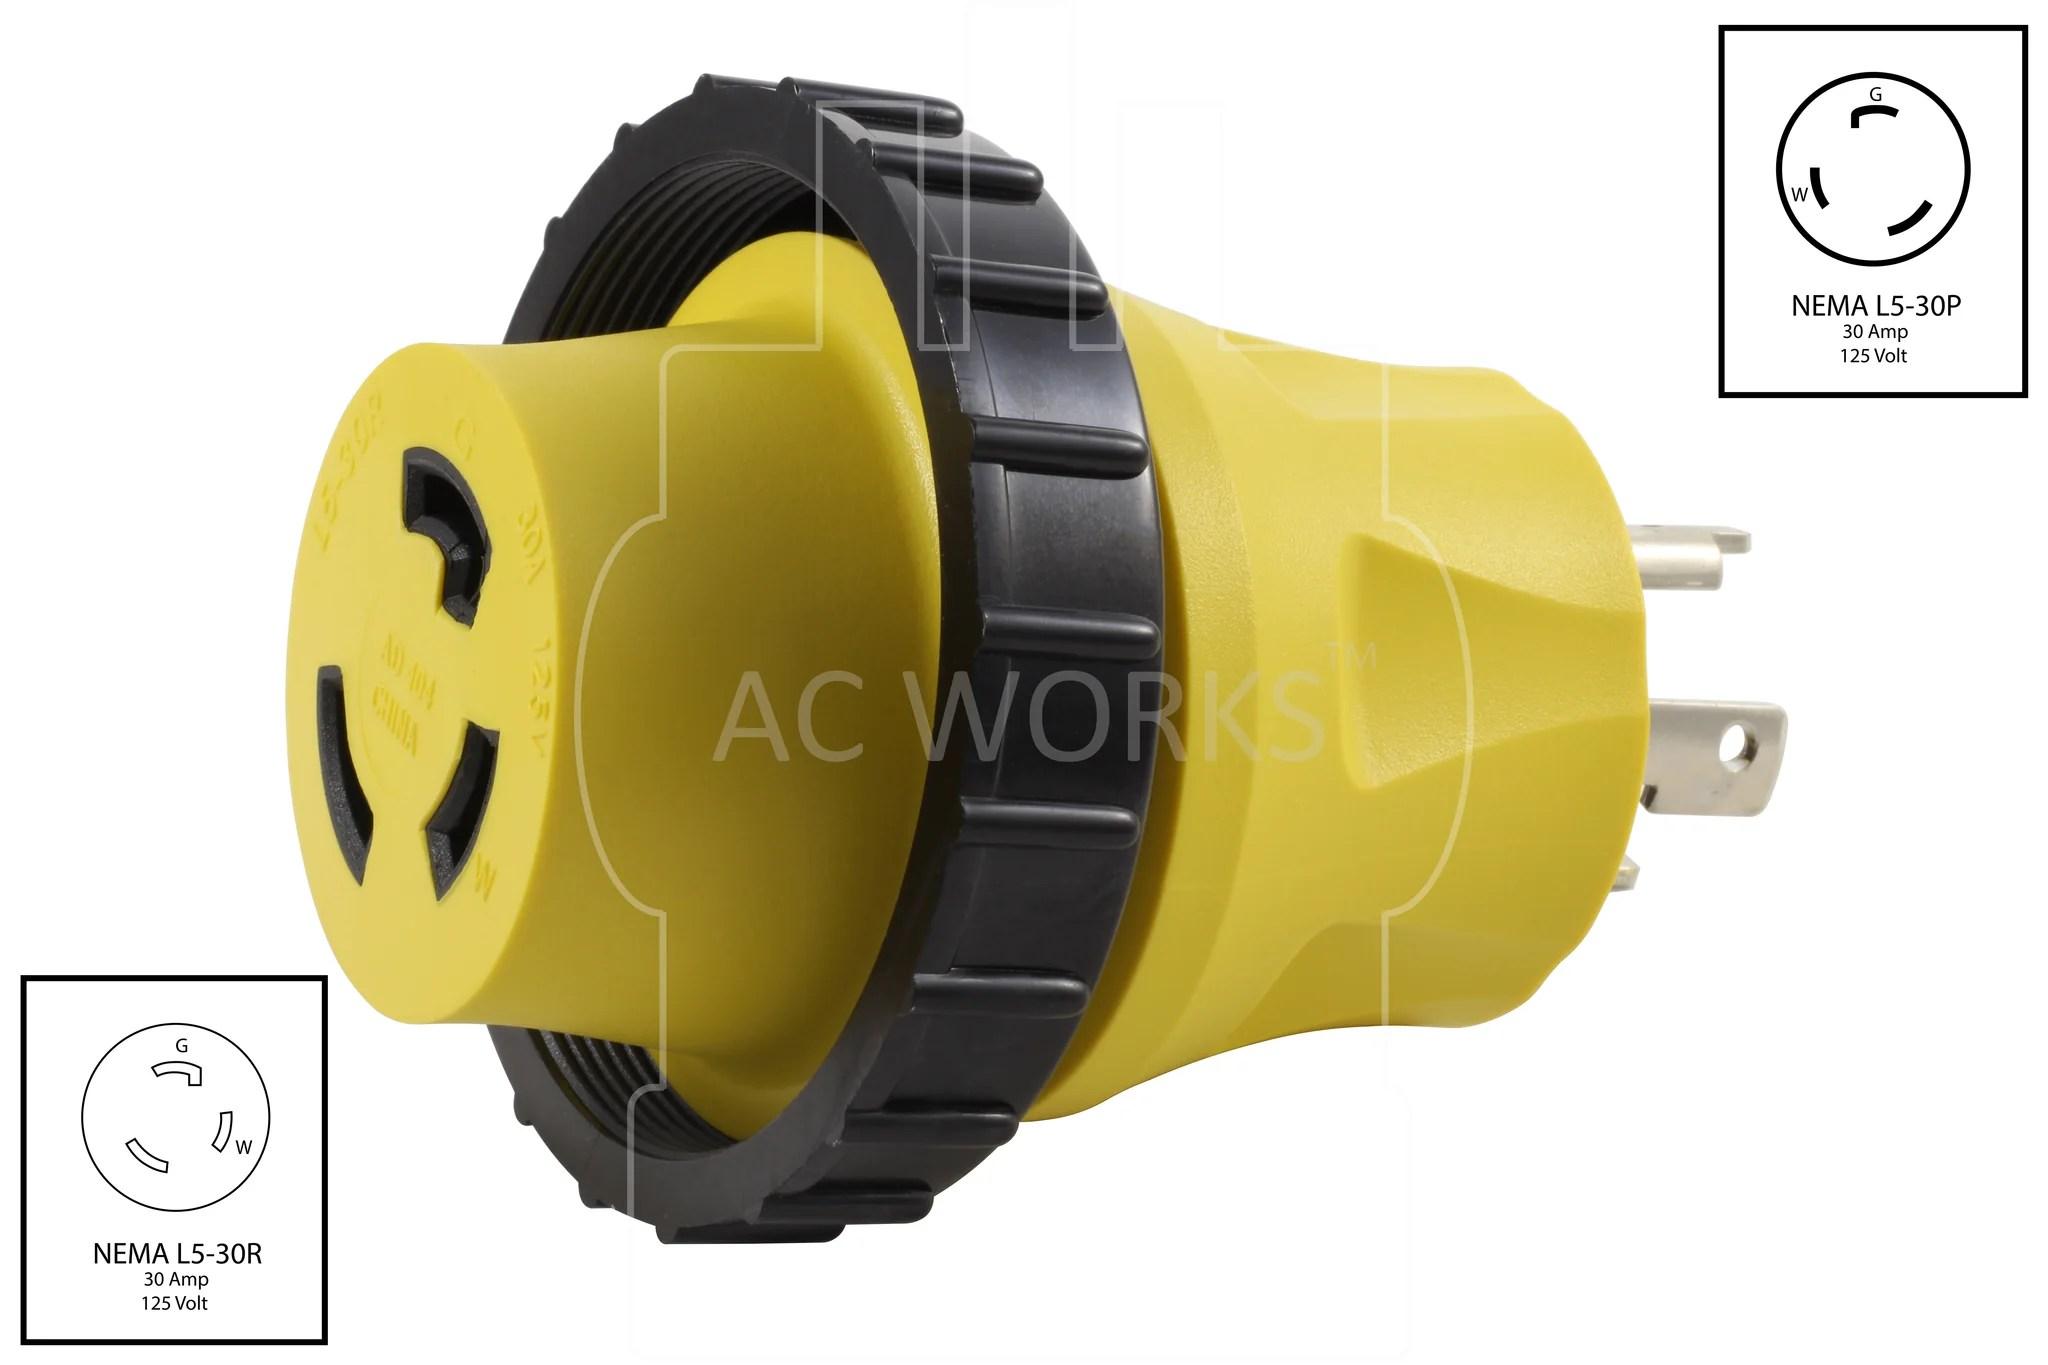 small resolution of l5 30p wiring ac plug wiring diagrams ac works rv marine adapter 30a locking plug